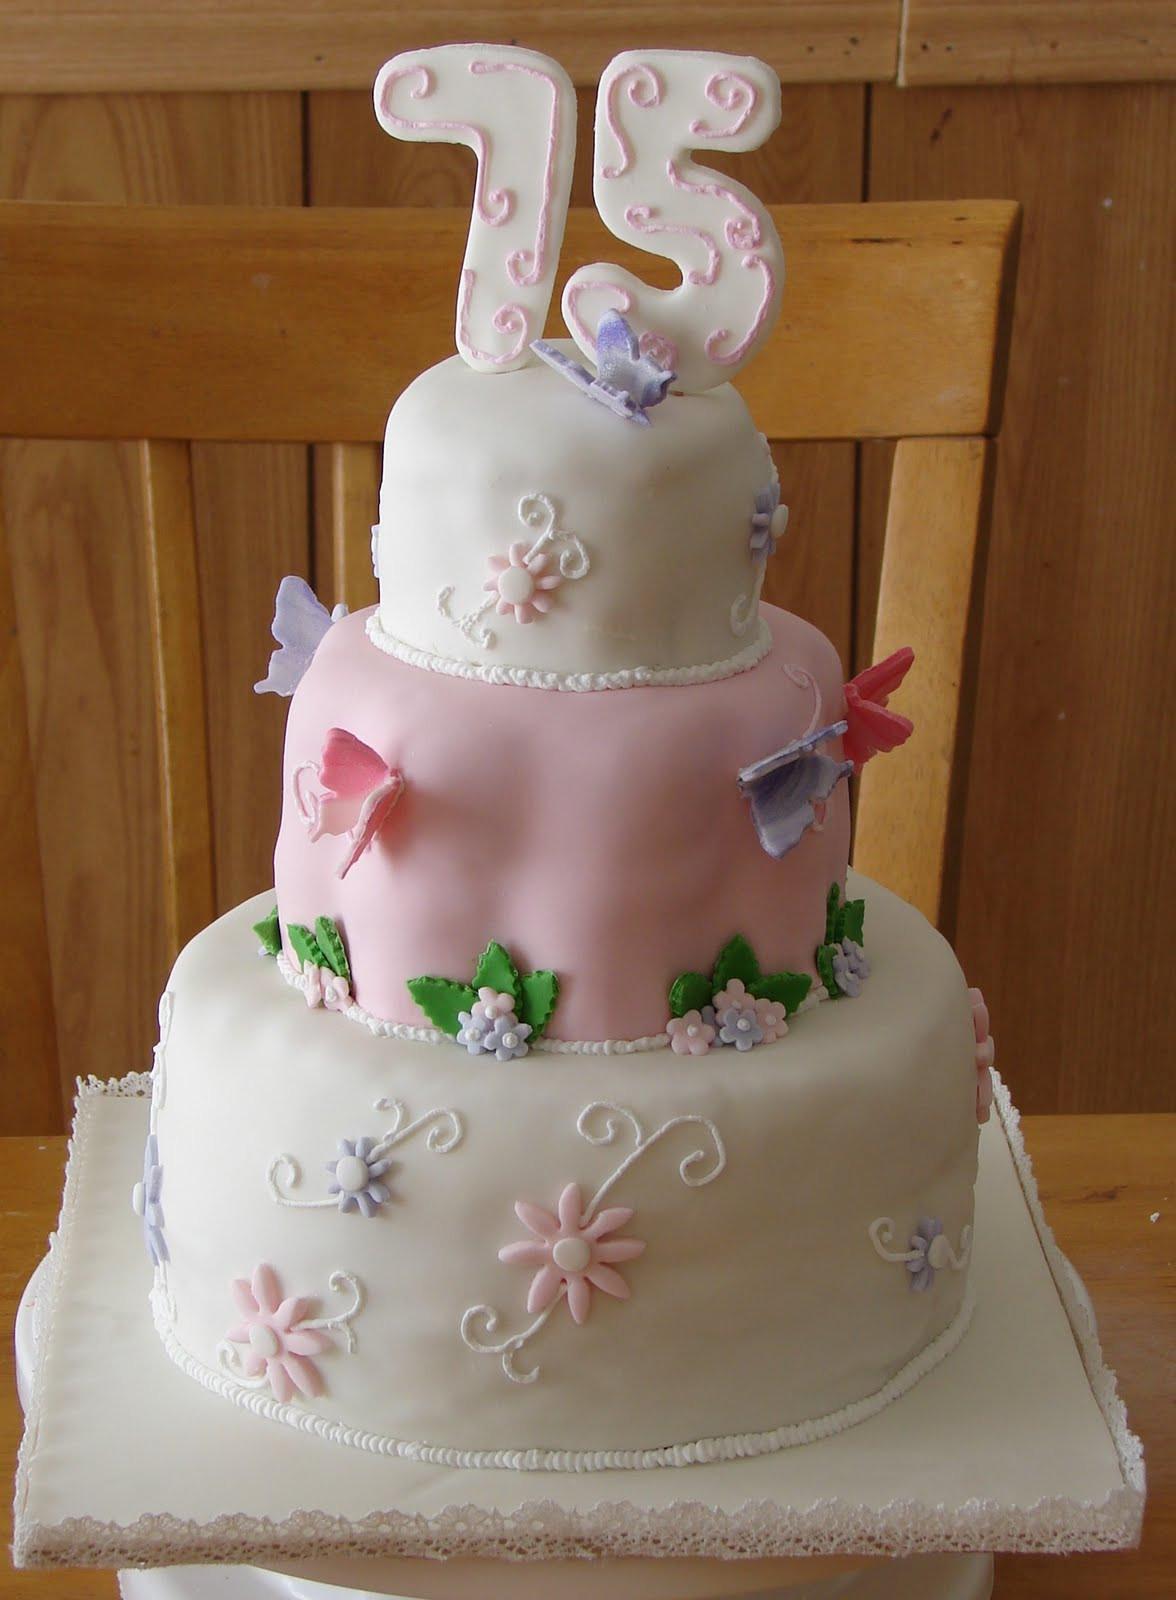 75th Birthday Cakes  My Cake Hobby 75th Birthday Cake